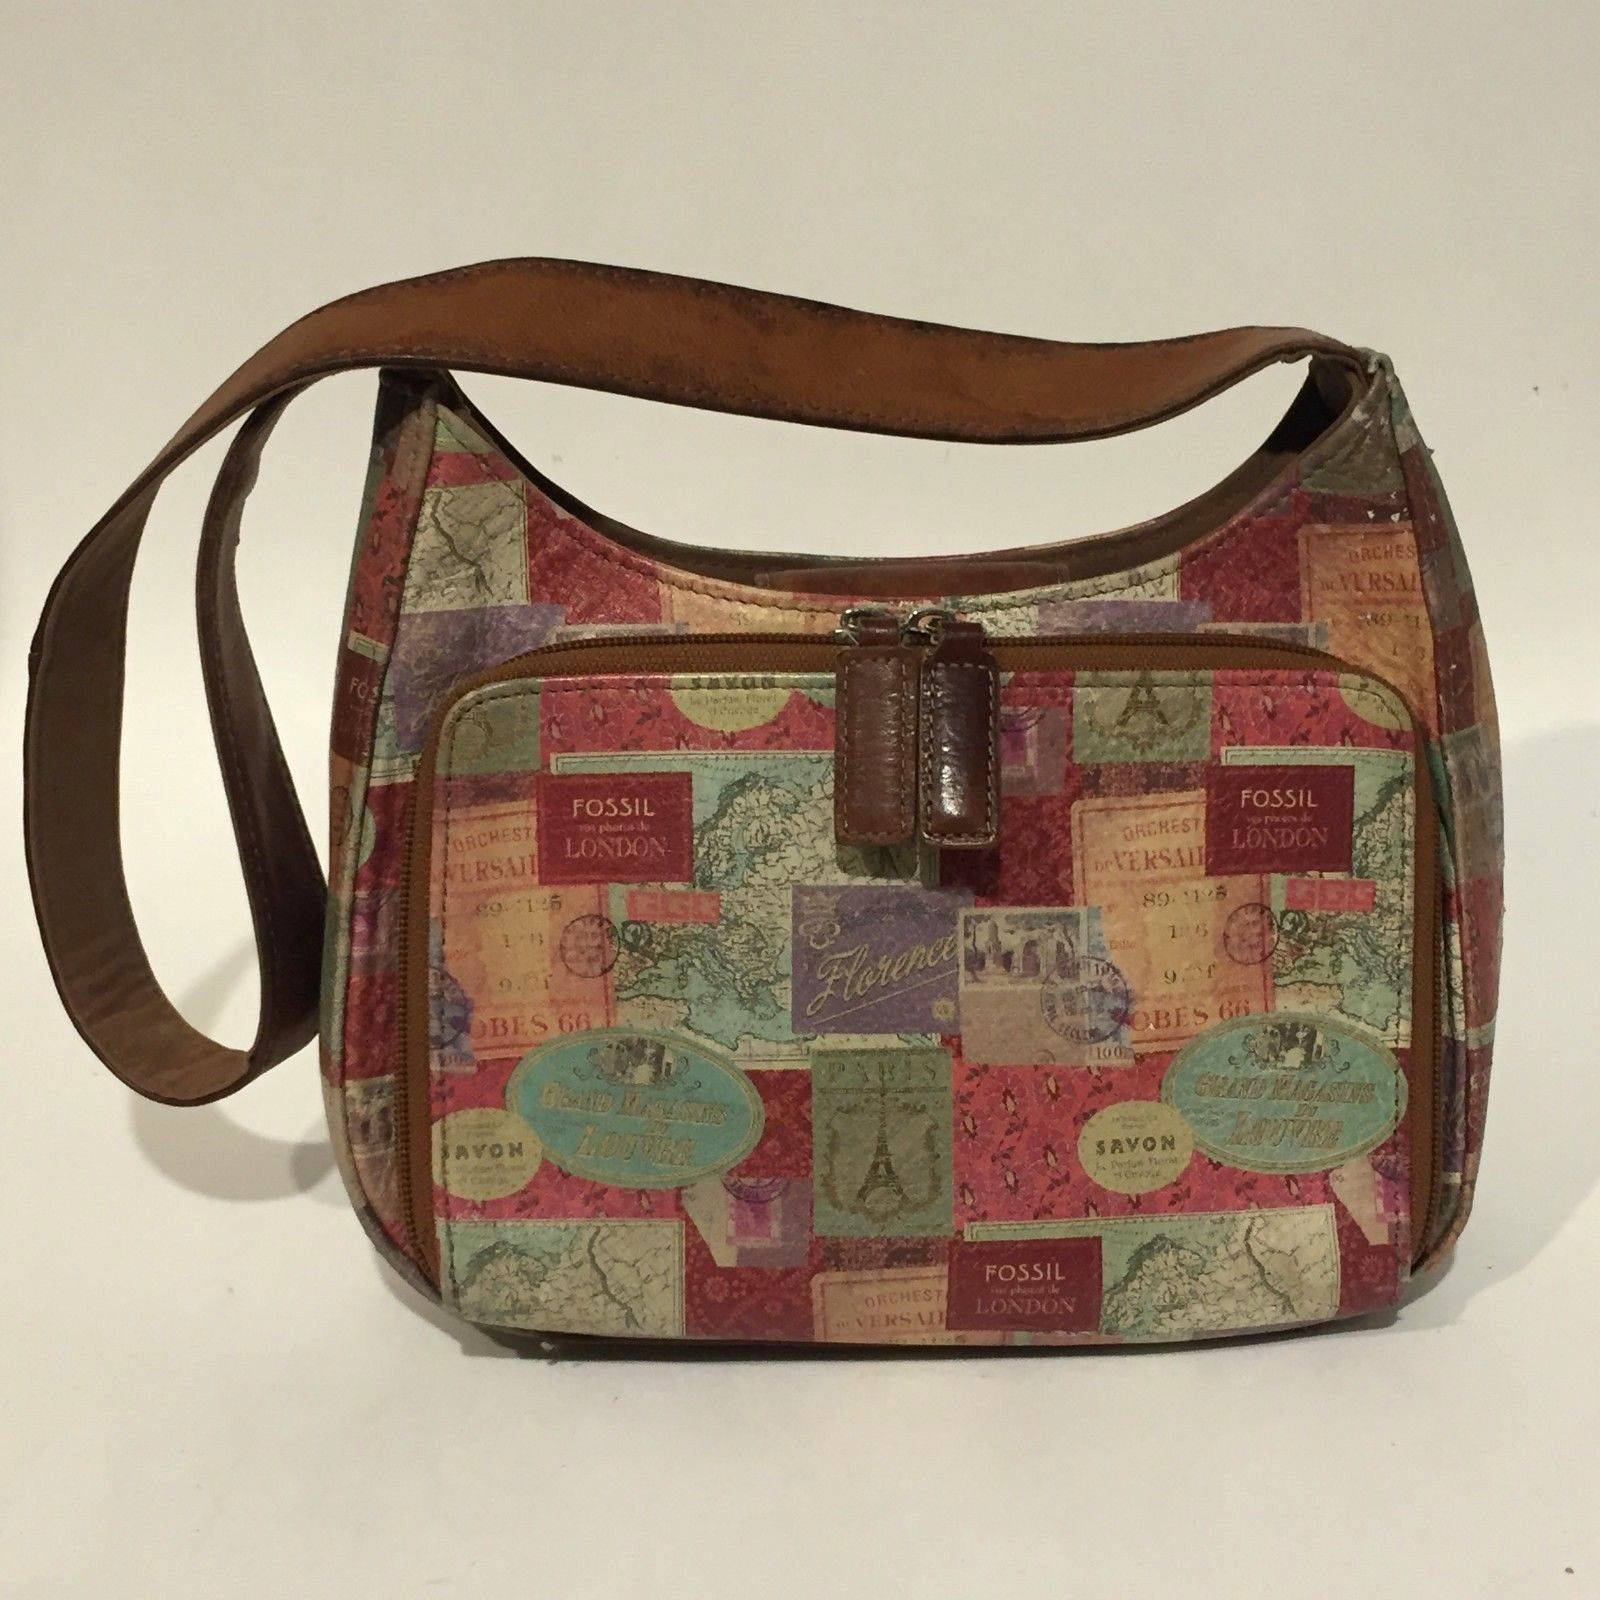 Vintage Small FOSSIL Shoulder Bag Printed Leather Organizer